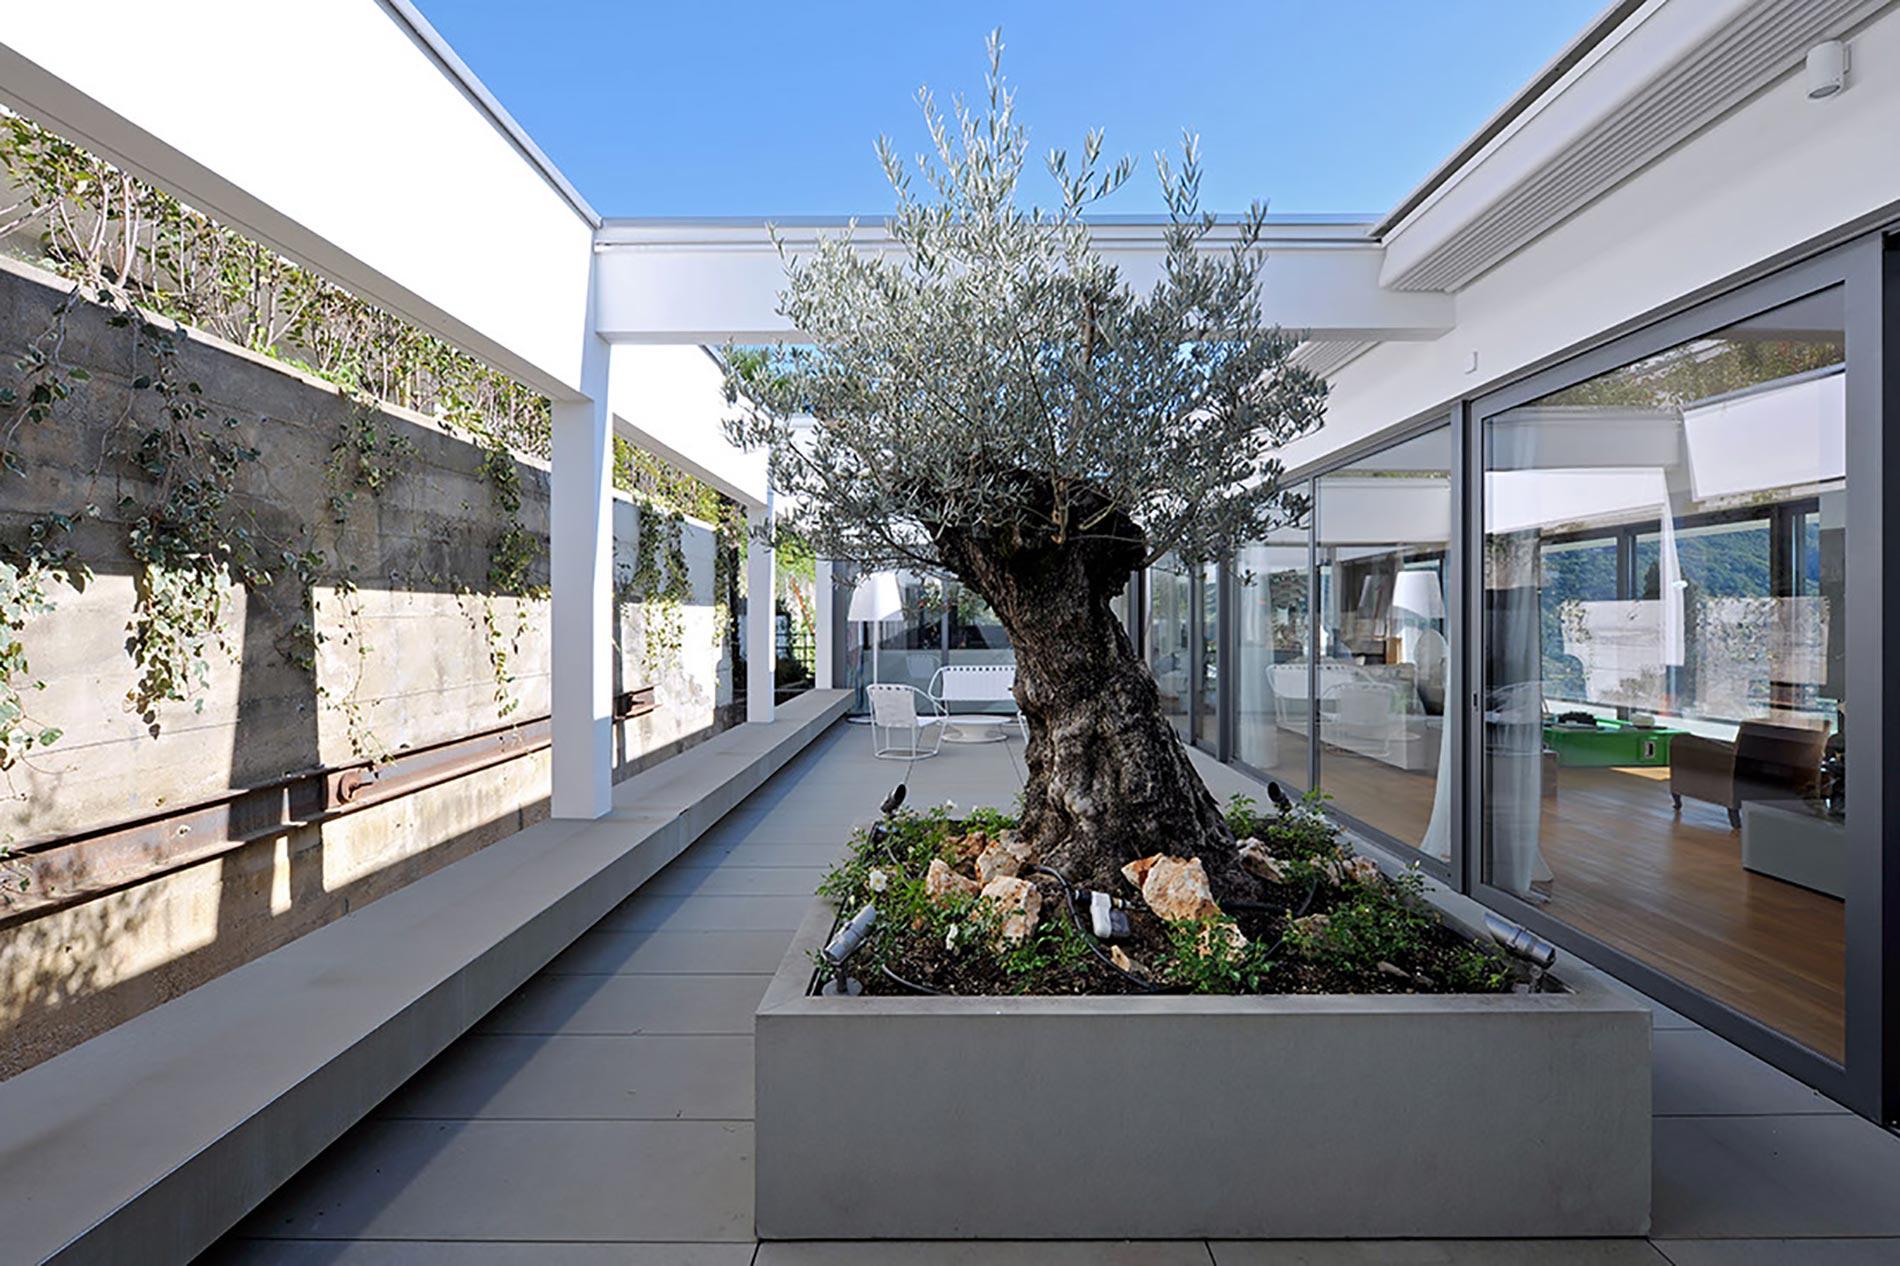 villa-lugano-antoniolupi---ingresso-albero